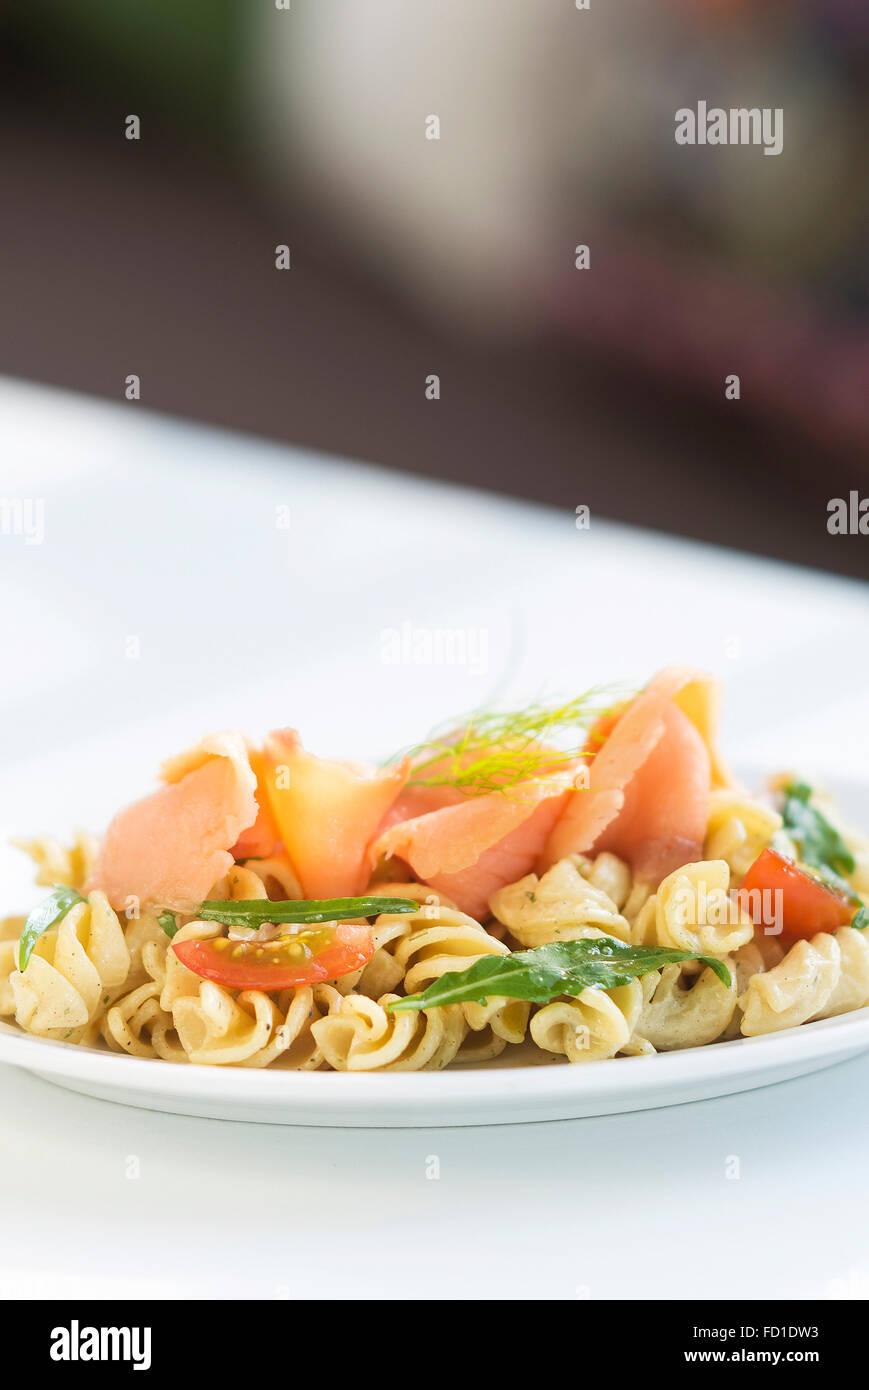 smoked salmon tomato rocket and cream pasta - Stock Image